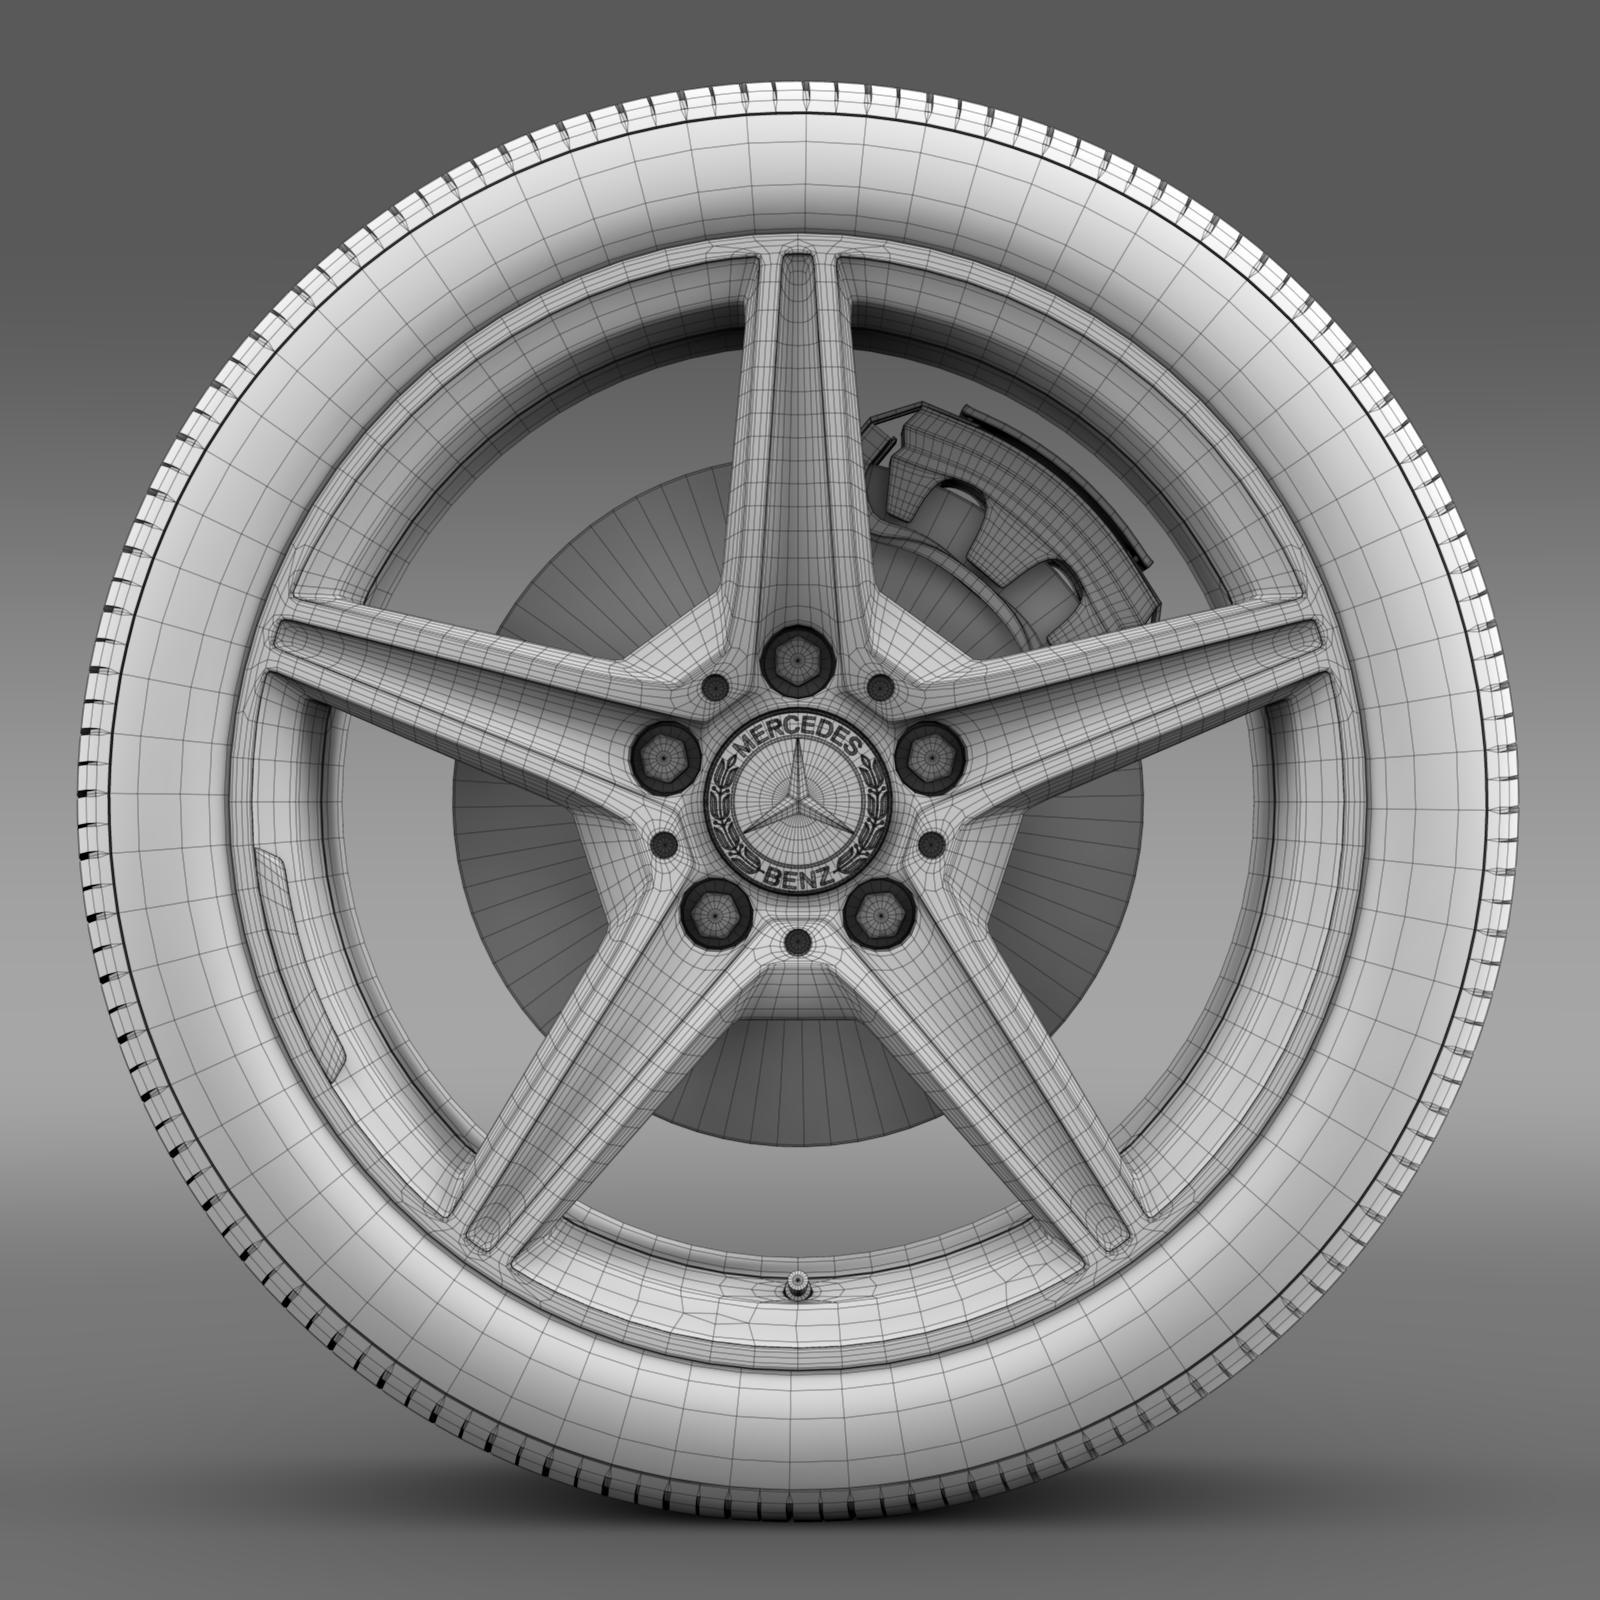 mercedes benz c 400 4matic amg line wheel 3d model 3ds max fbx c4d lwo ma mb hrc xsi obj 210793